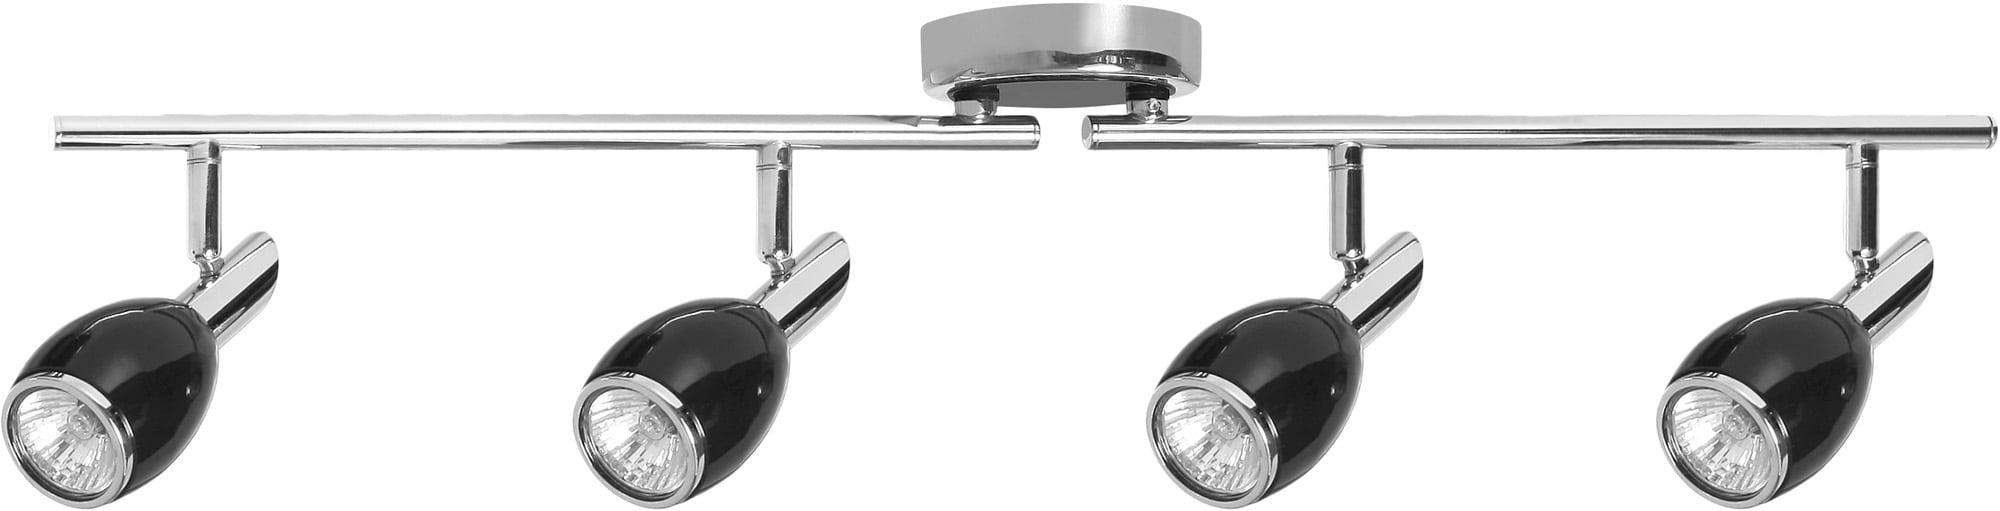 4-point Black LED GU10 Spotlights